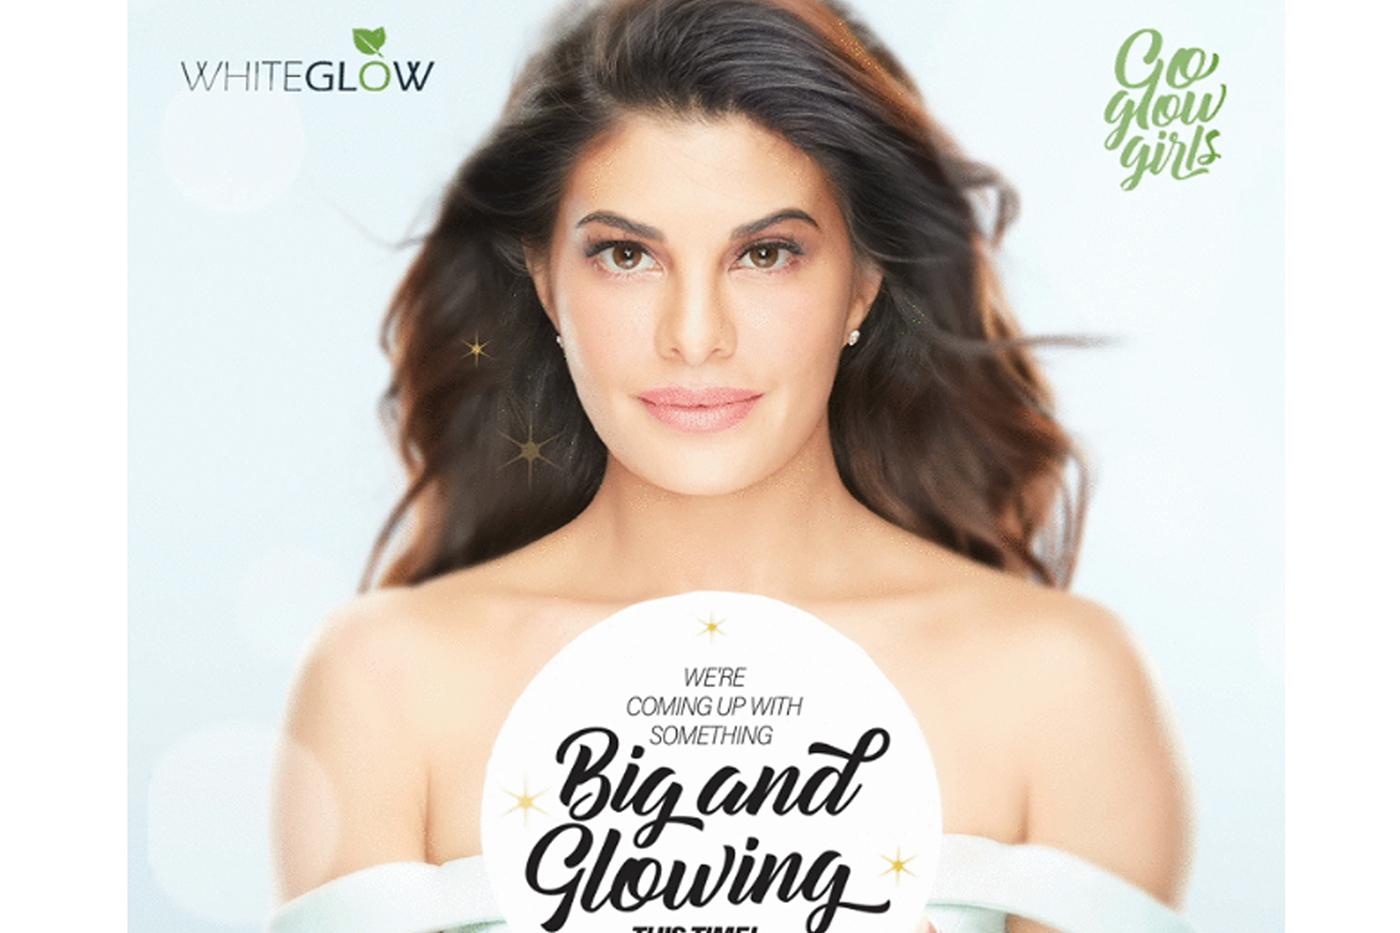 Jacqueline Fernandez leads the Lotus 'Go Glow Girls' campaign